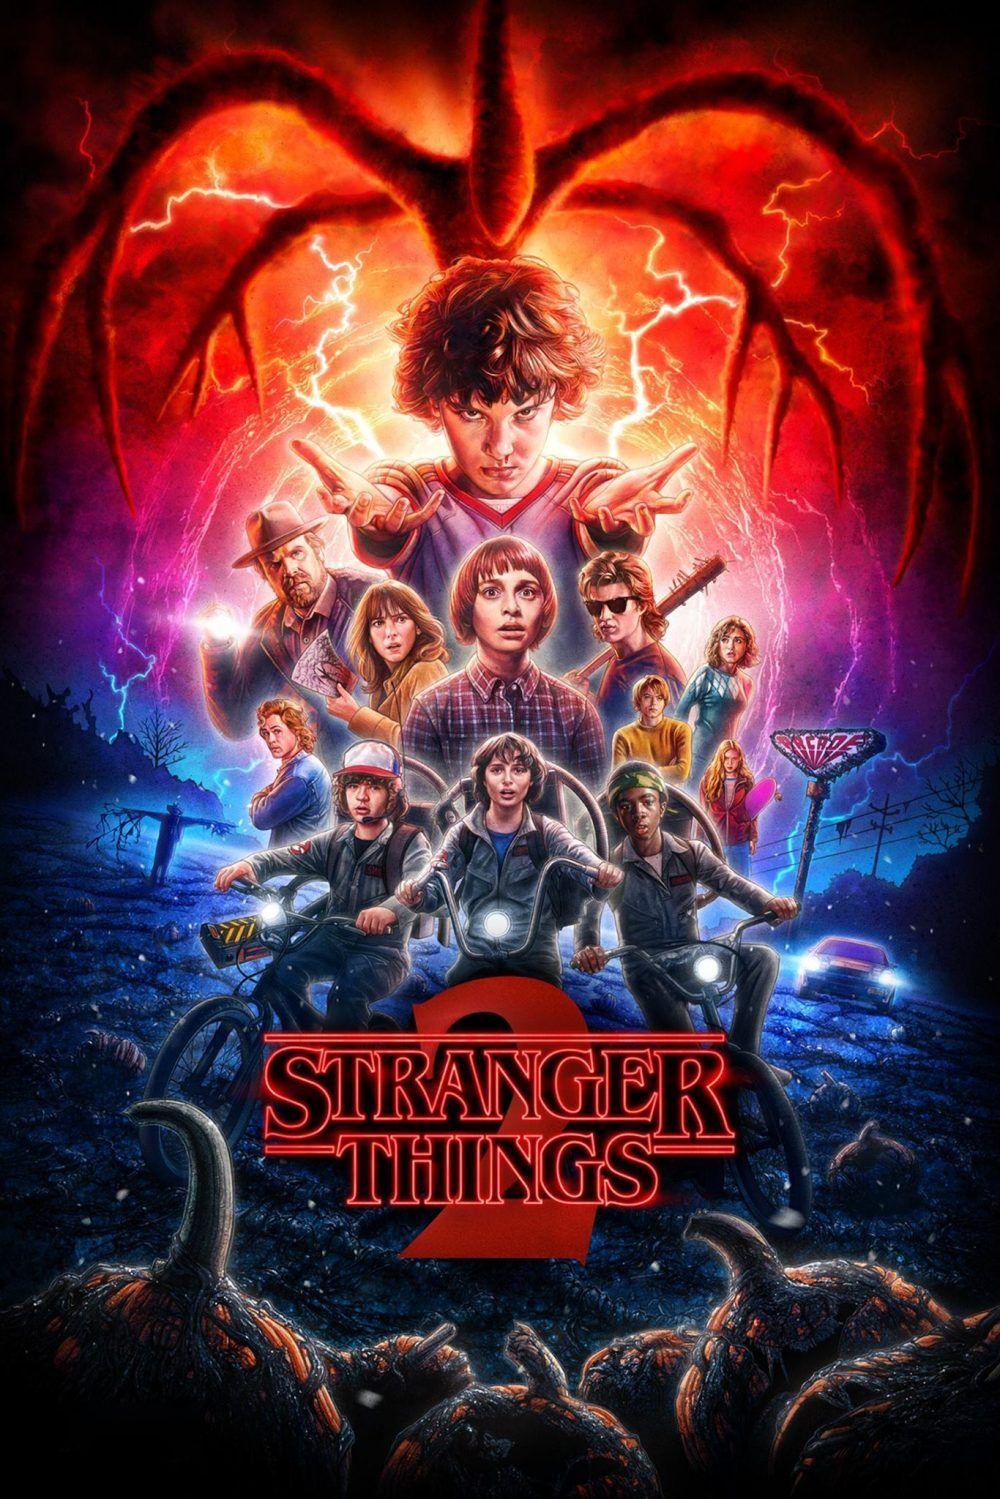 Stranger Things Streaming Film E Serie Tv In Altadefinizione Hd Film Di Netflix Sfondi Sfondi Iphone